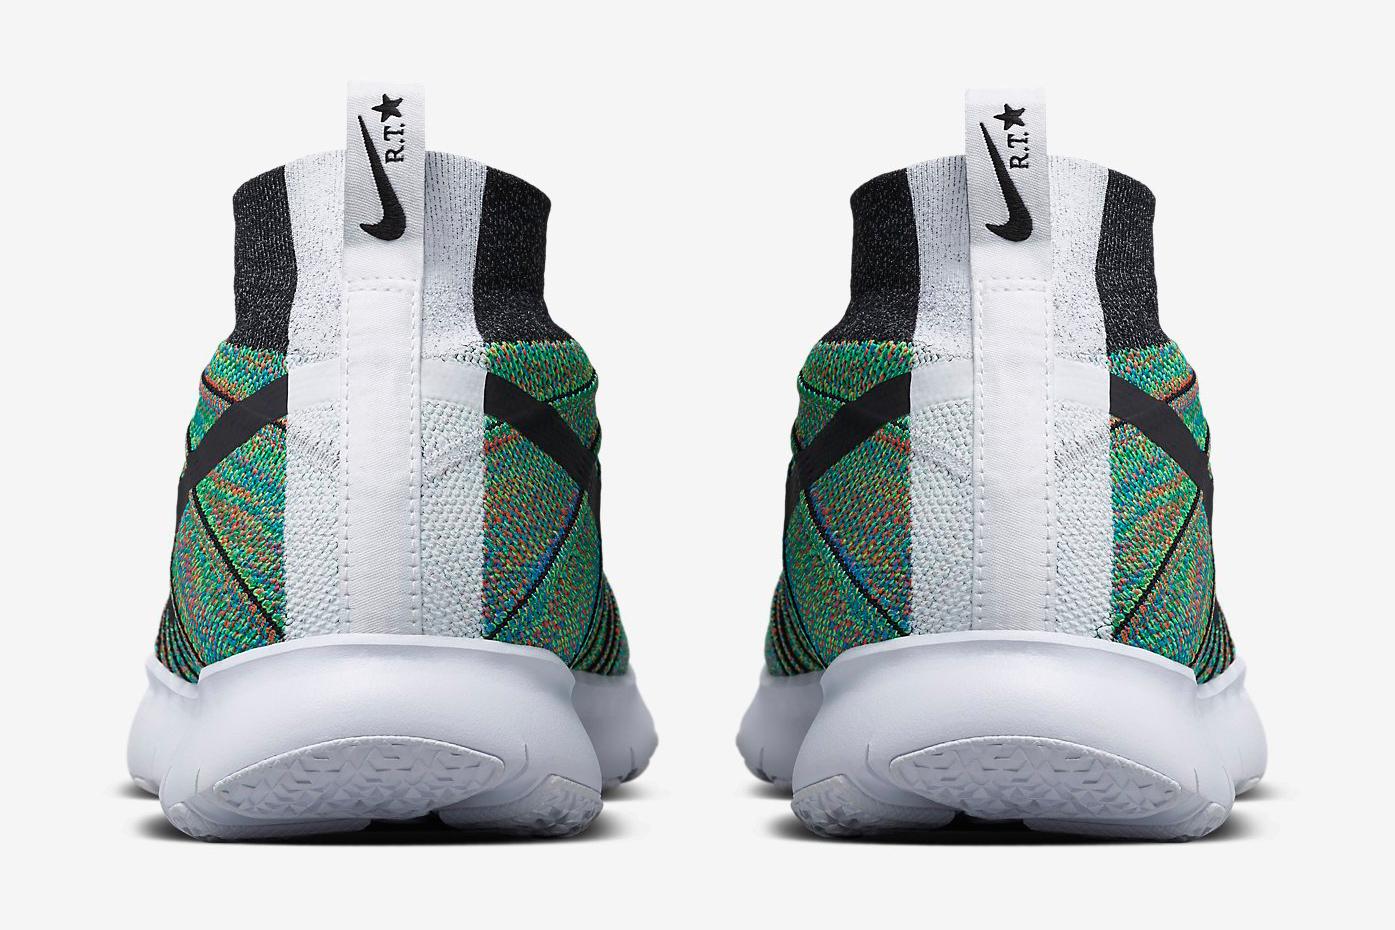 nikelab-riccardo-tisci-multicolor-flyknit-sneakers-05